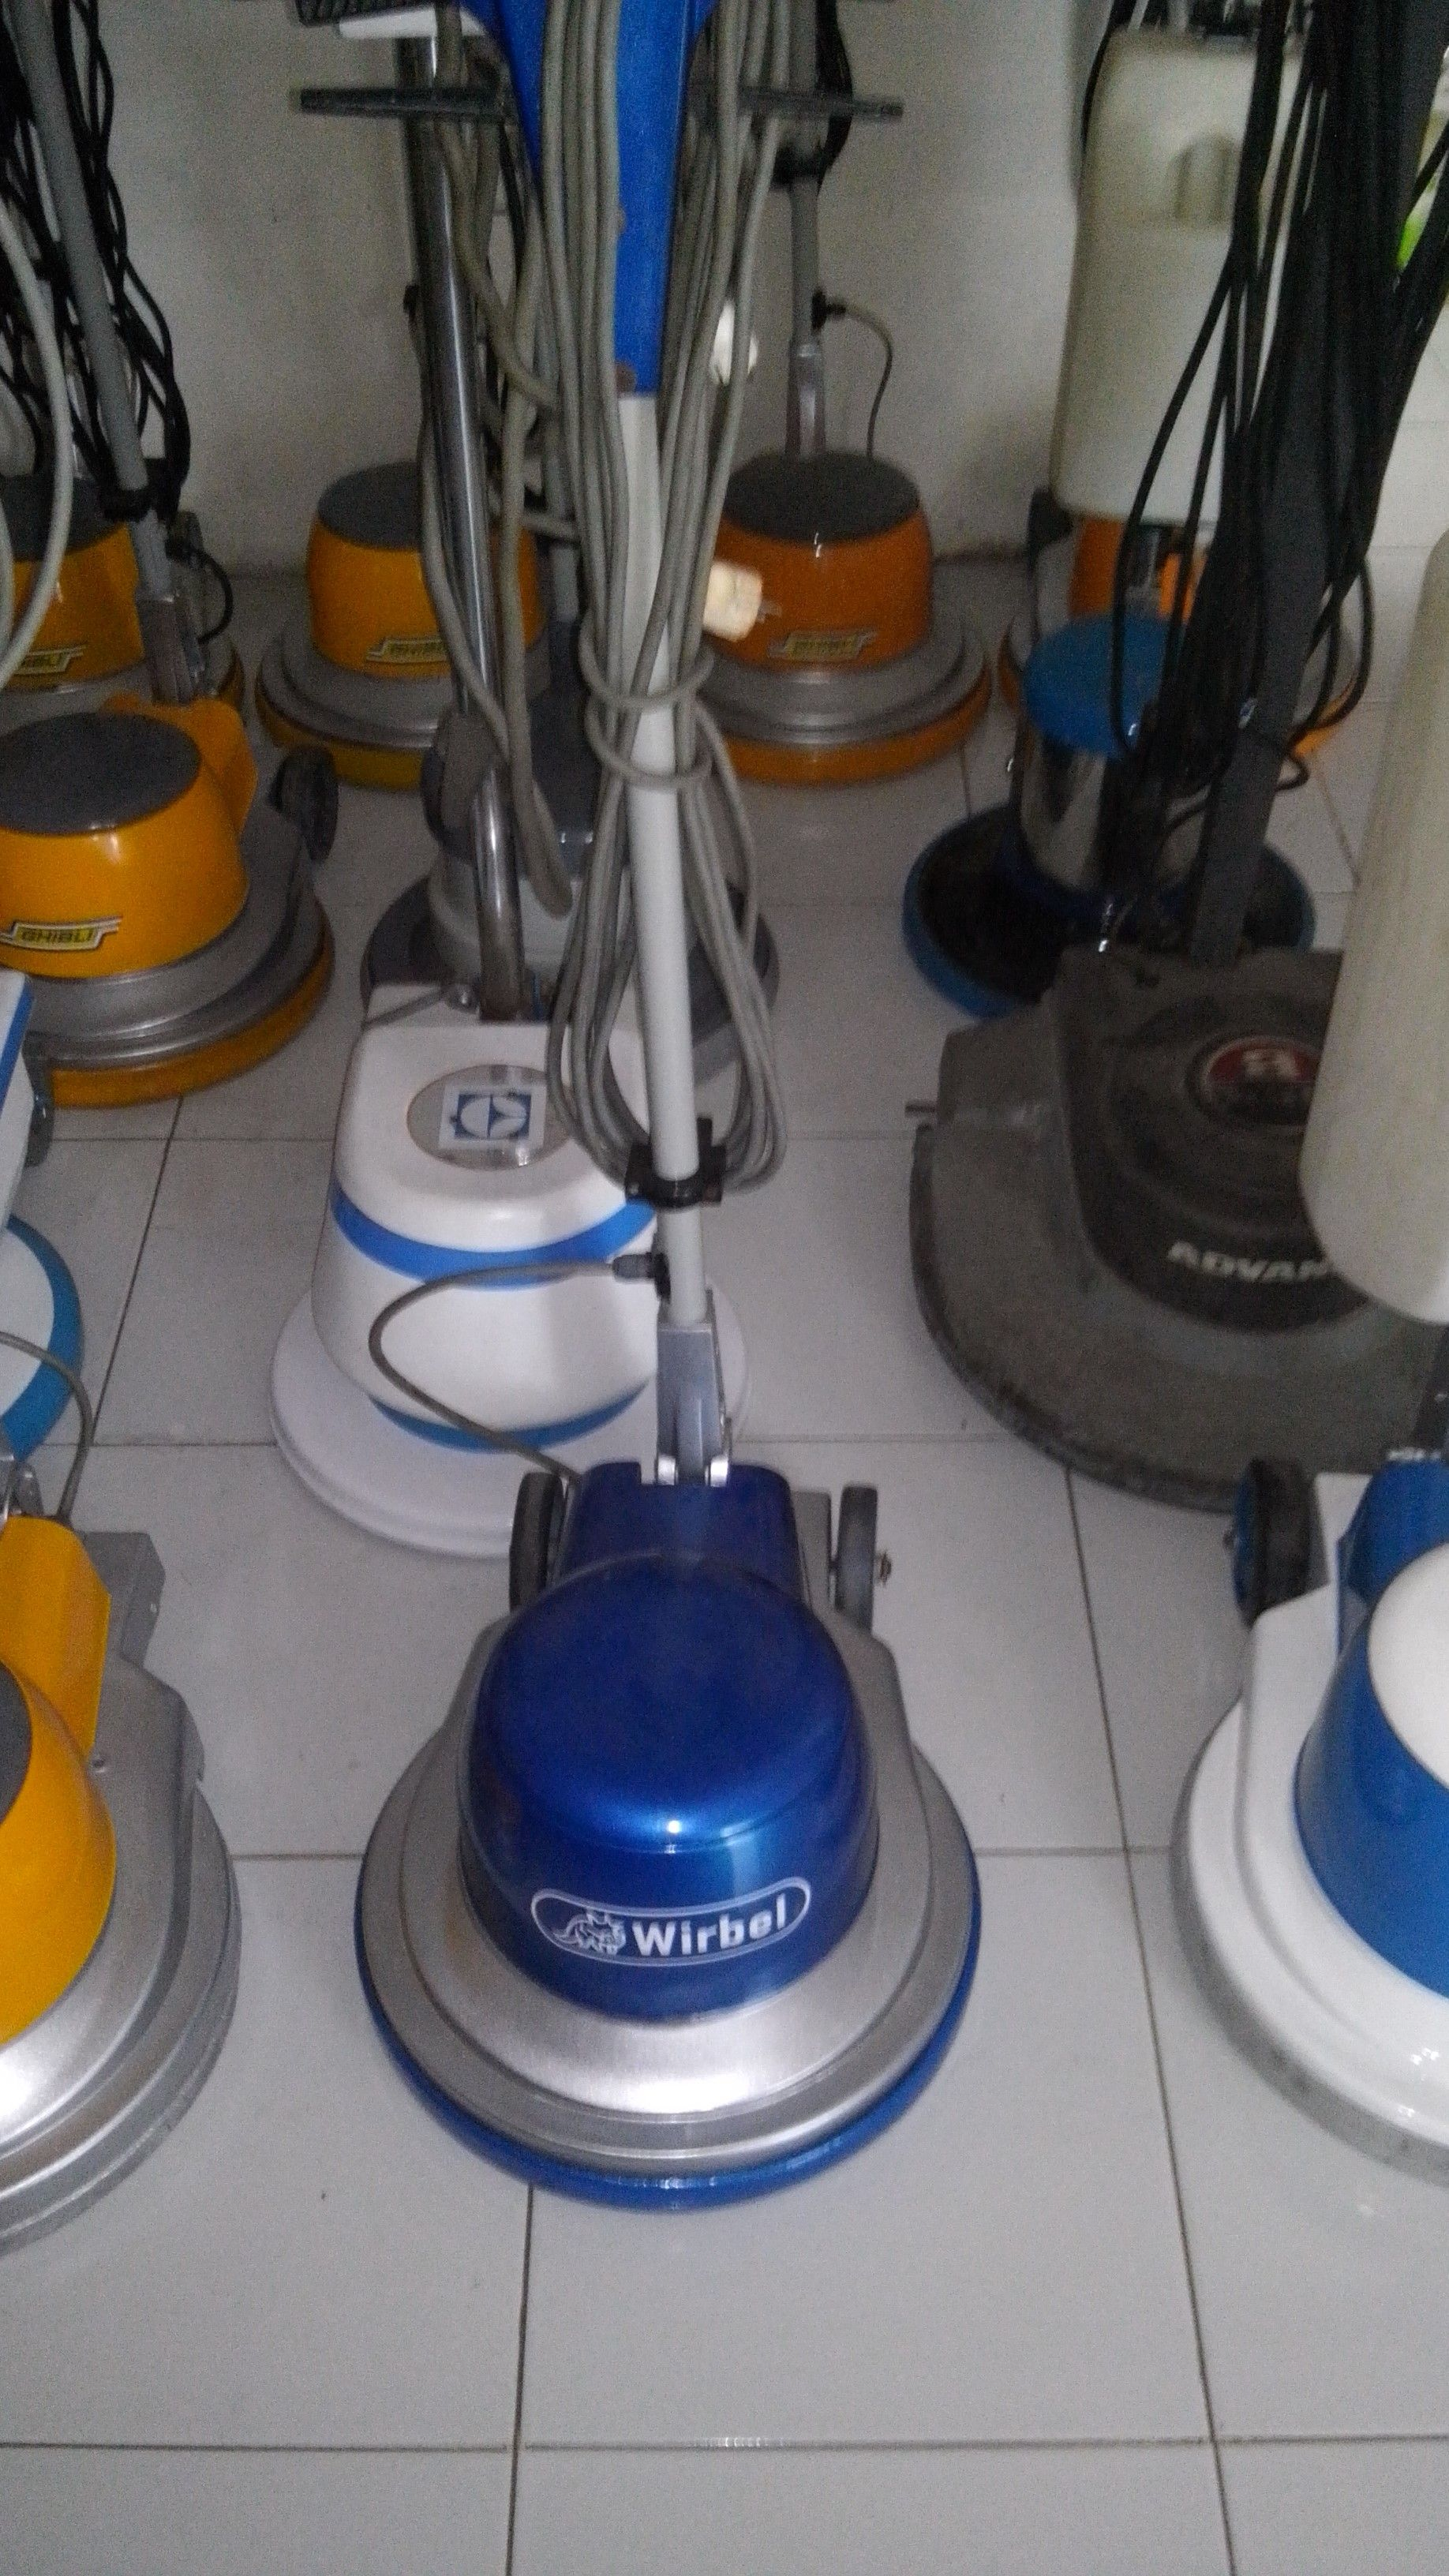 Jual Mesin Cleaning Second Mesin Poles Lantai Floor Polisher Wirbel 154 Spesifikasi Model Wirbel Candia Plus 154 Power 1000 Watt Diameter 17 In Lantai